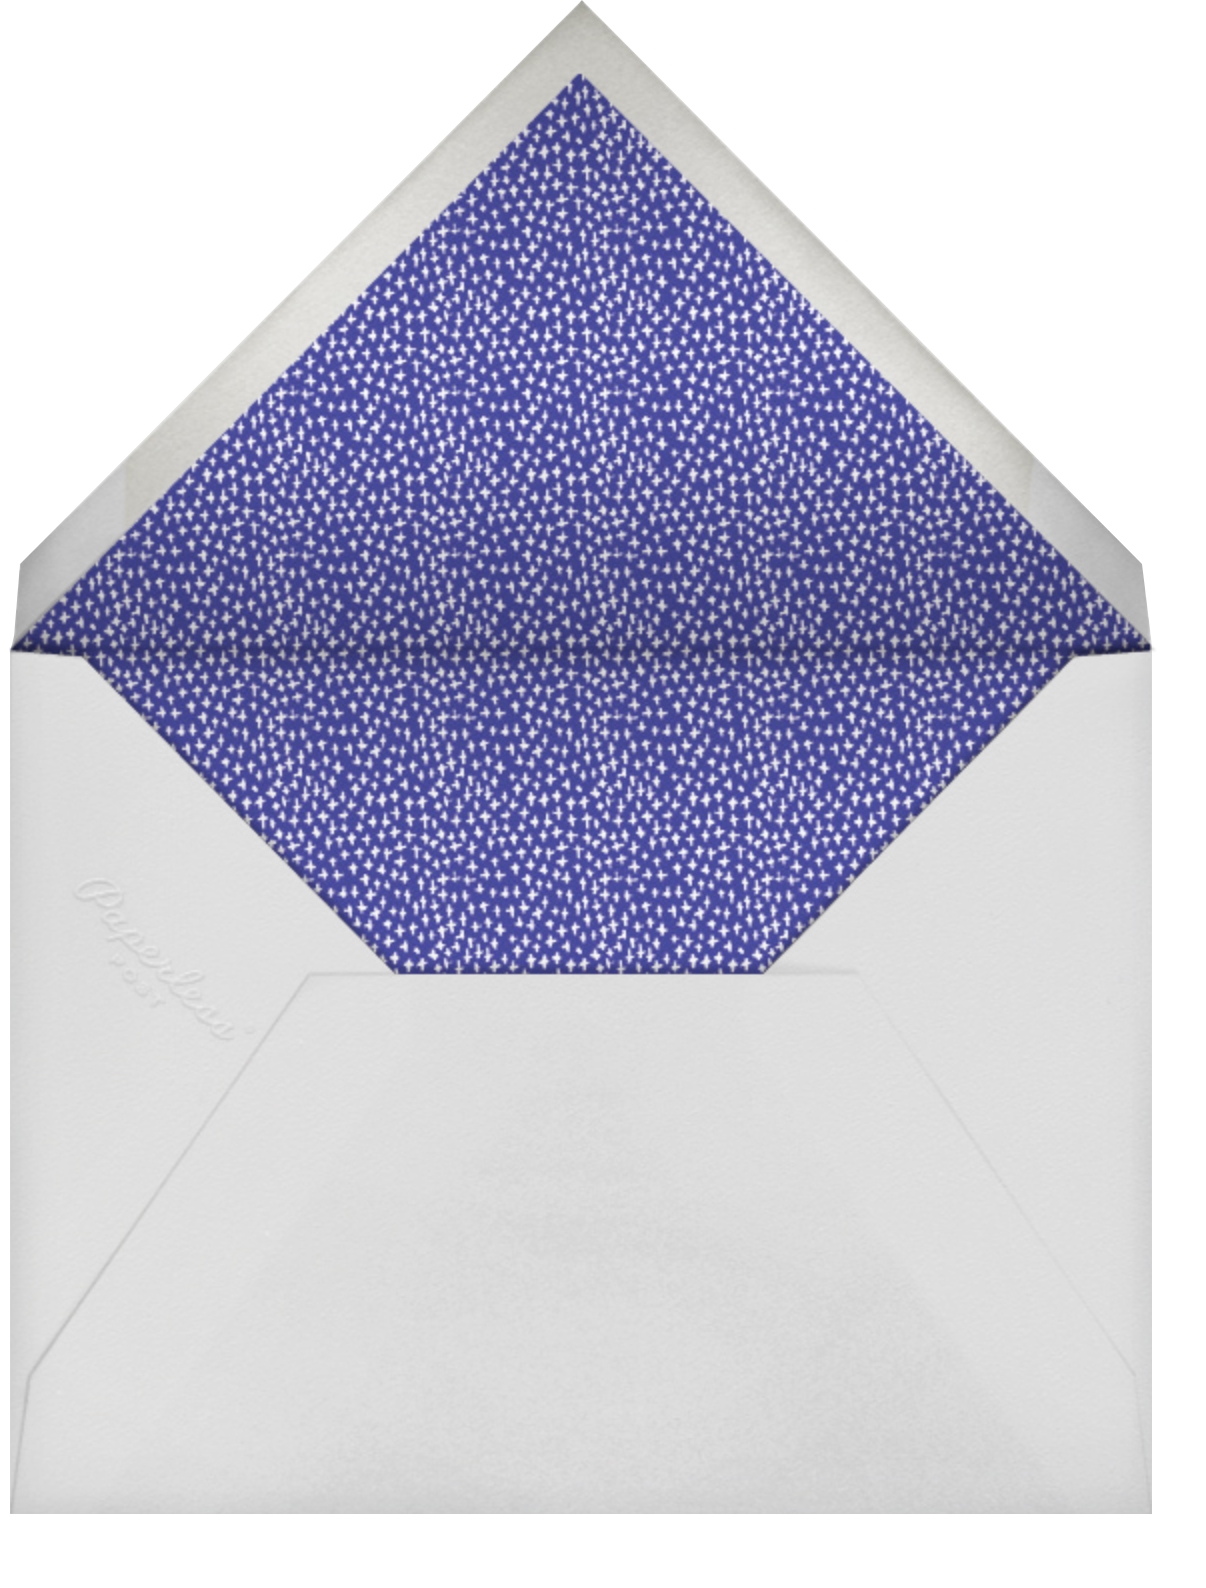 Penciled Garden - Mr. Boddington's Studio - Envelope